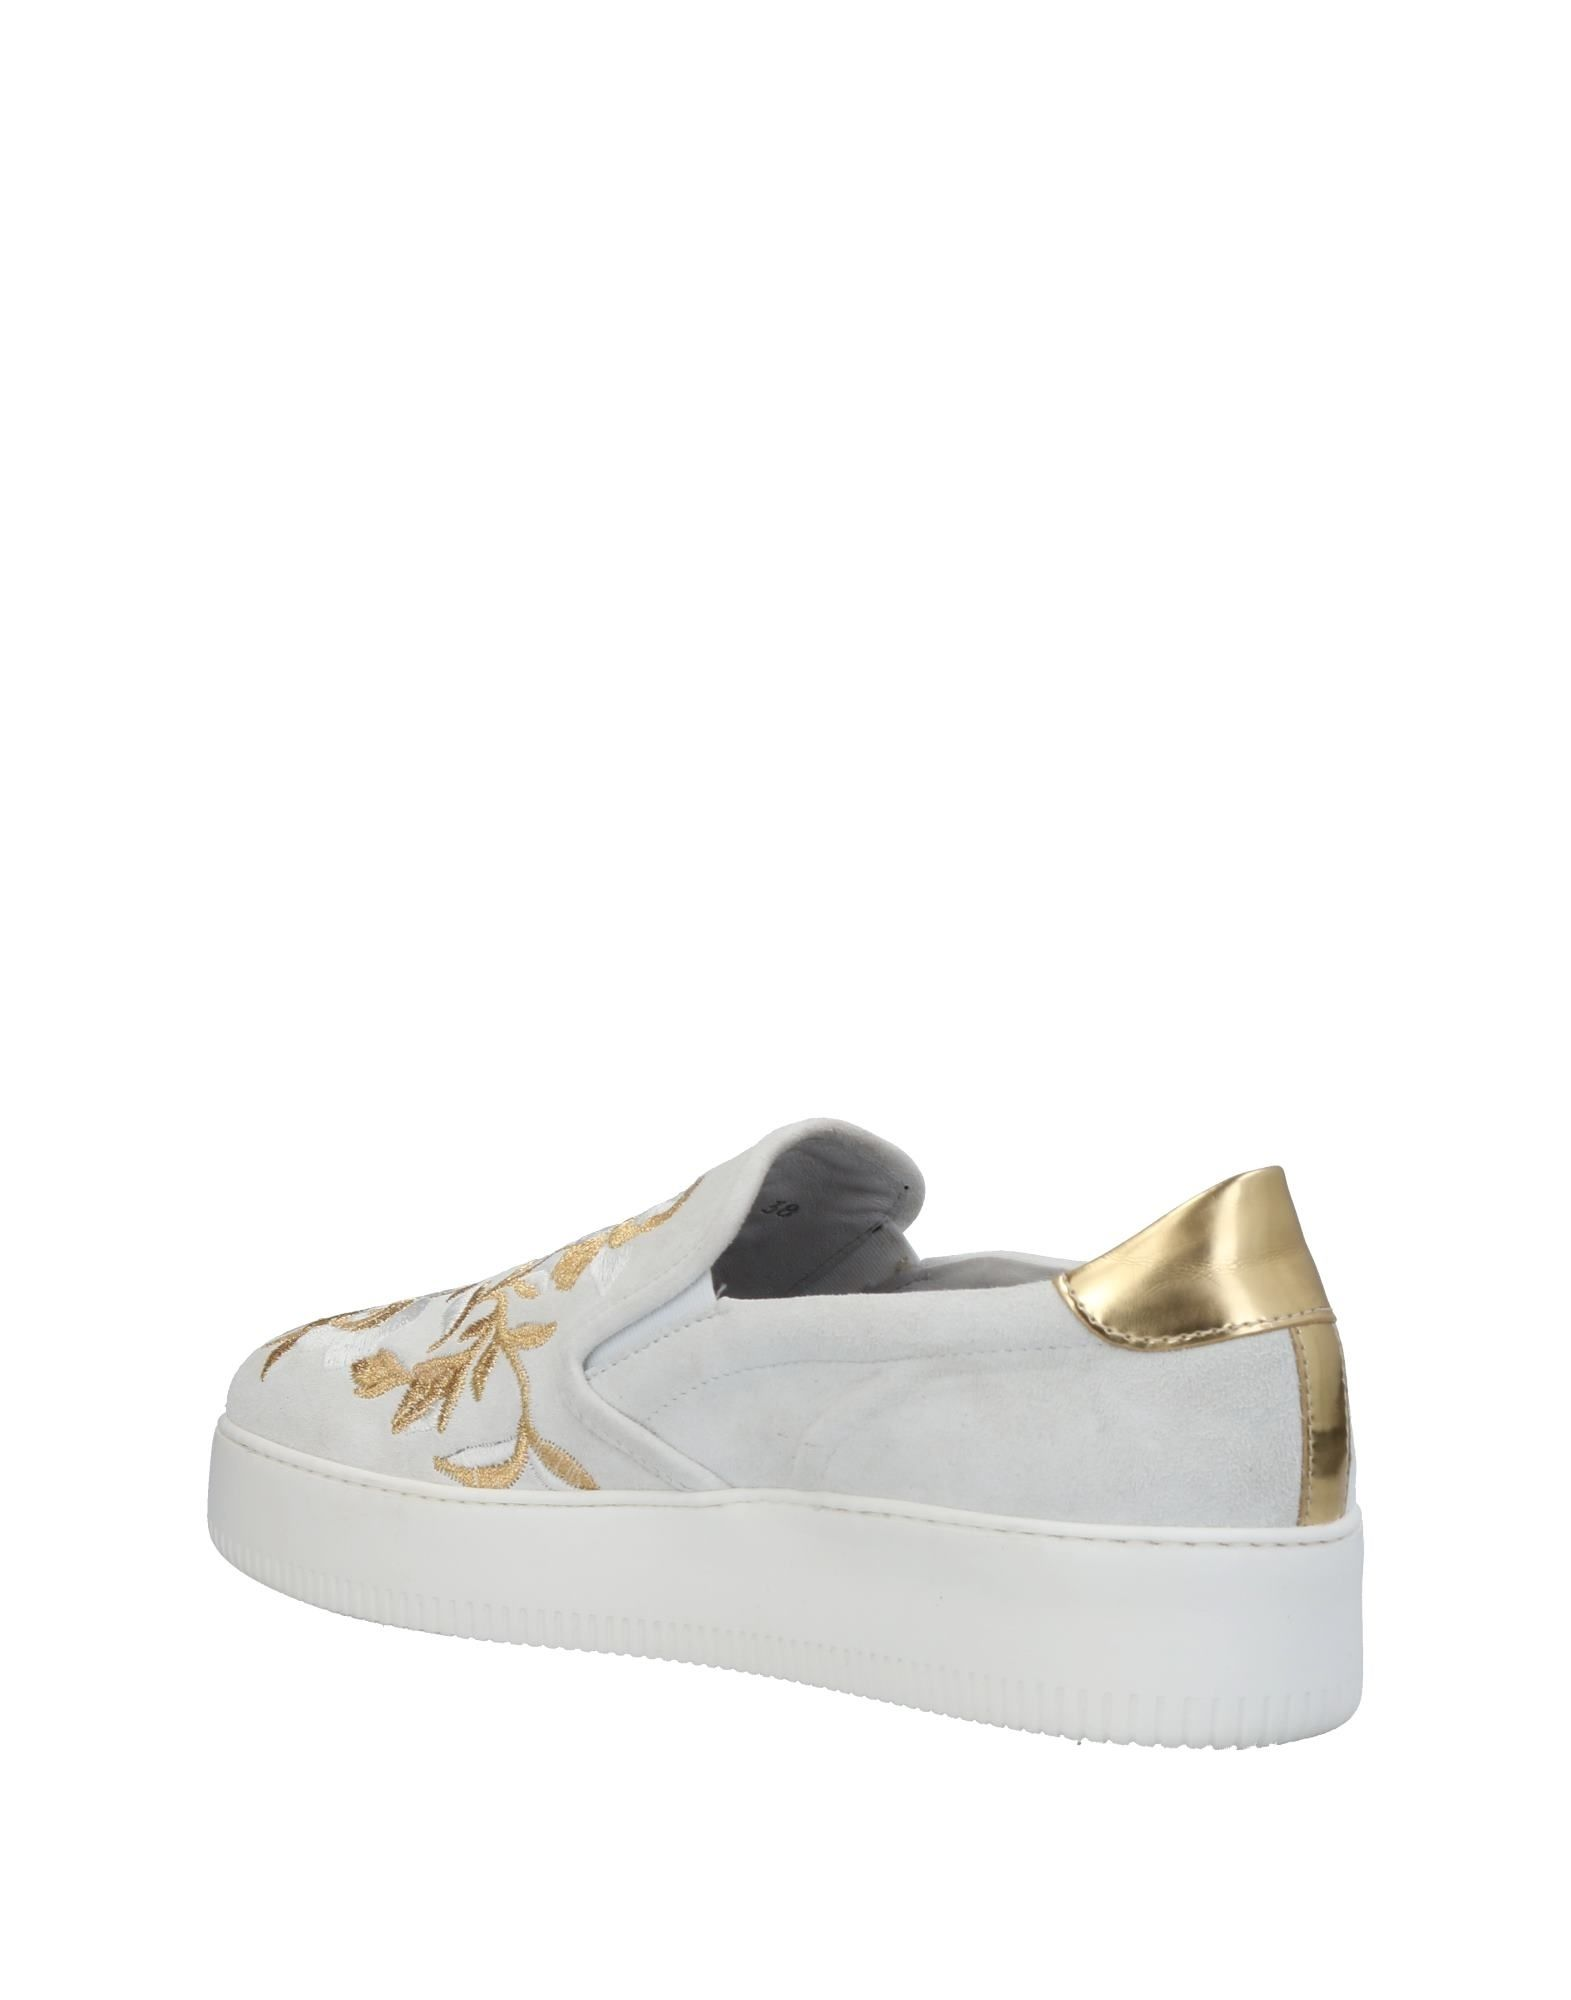 Sneakers Botticelli Femme - Sneakers Botticelli sur